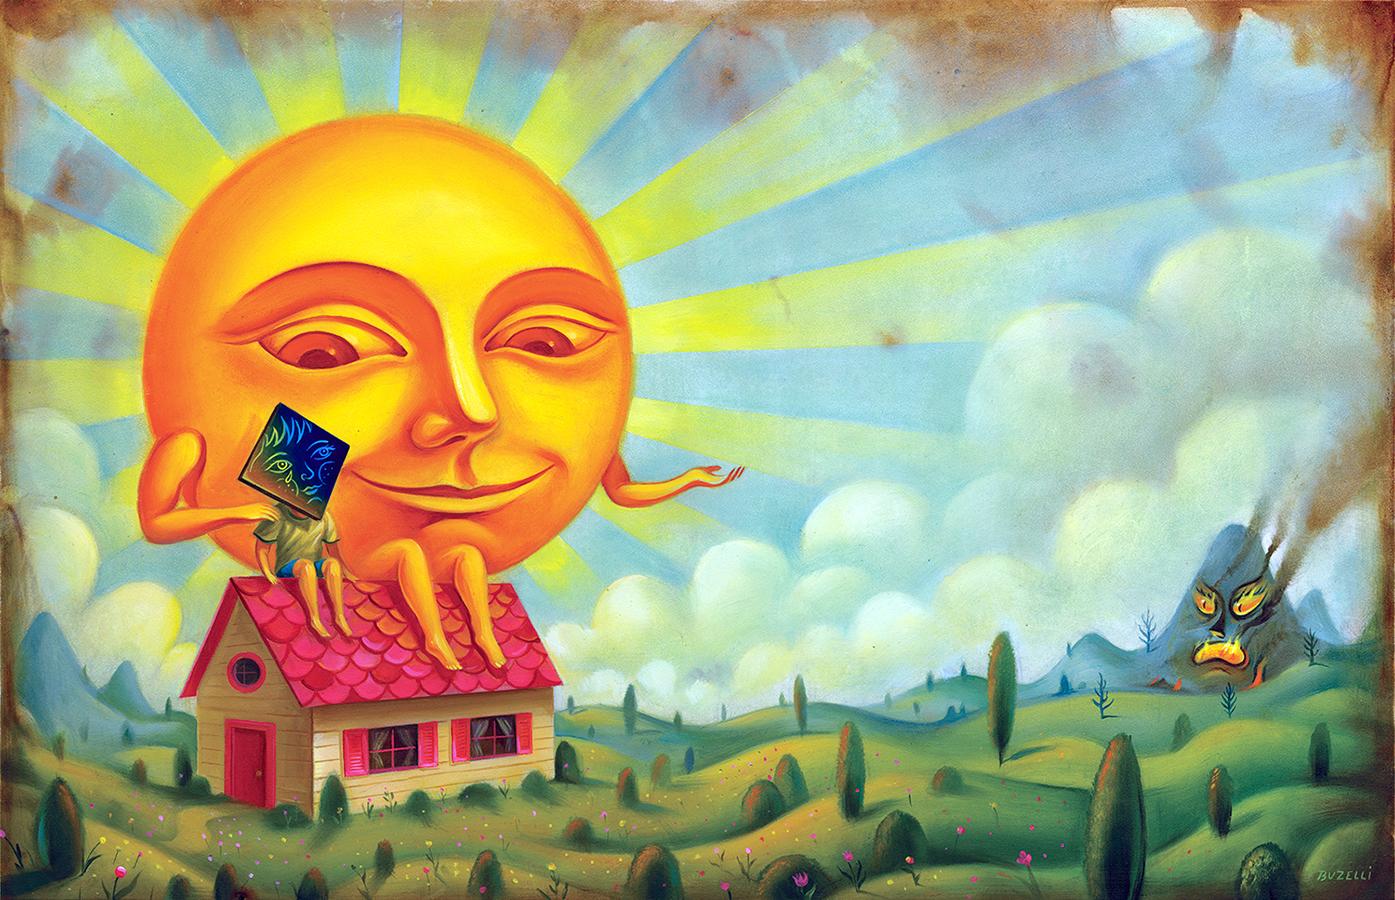 Entega_SolarBoy.jpg